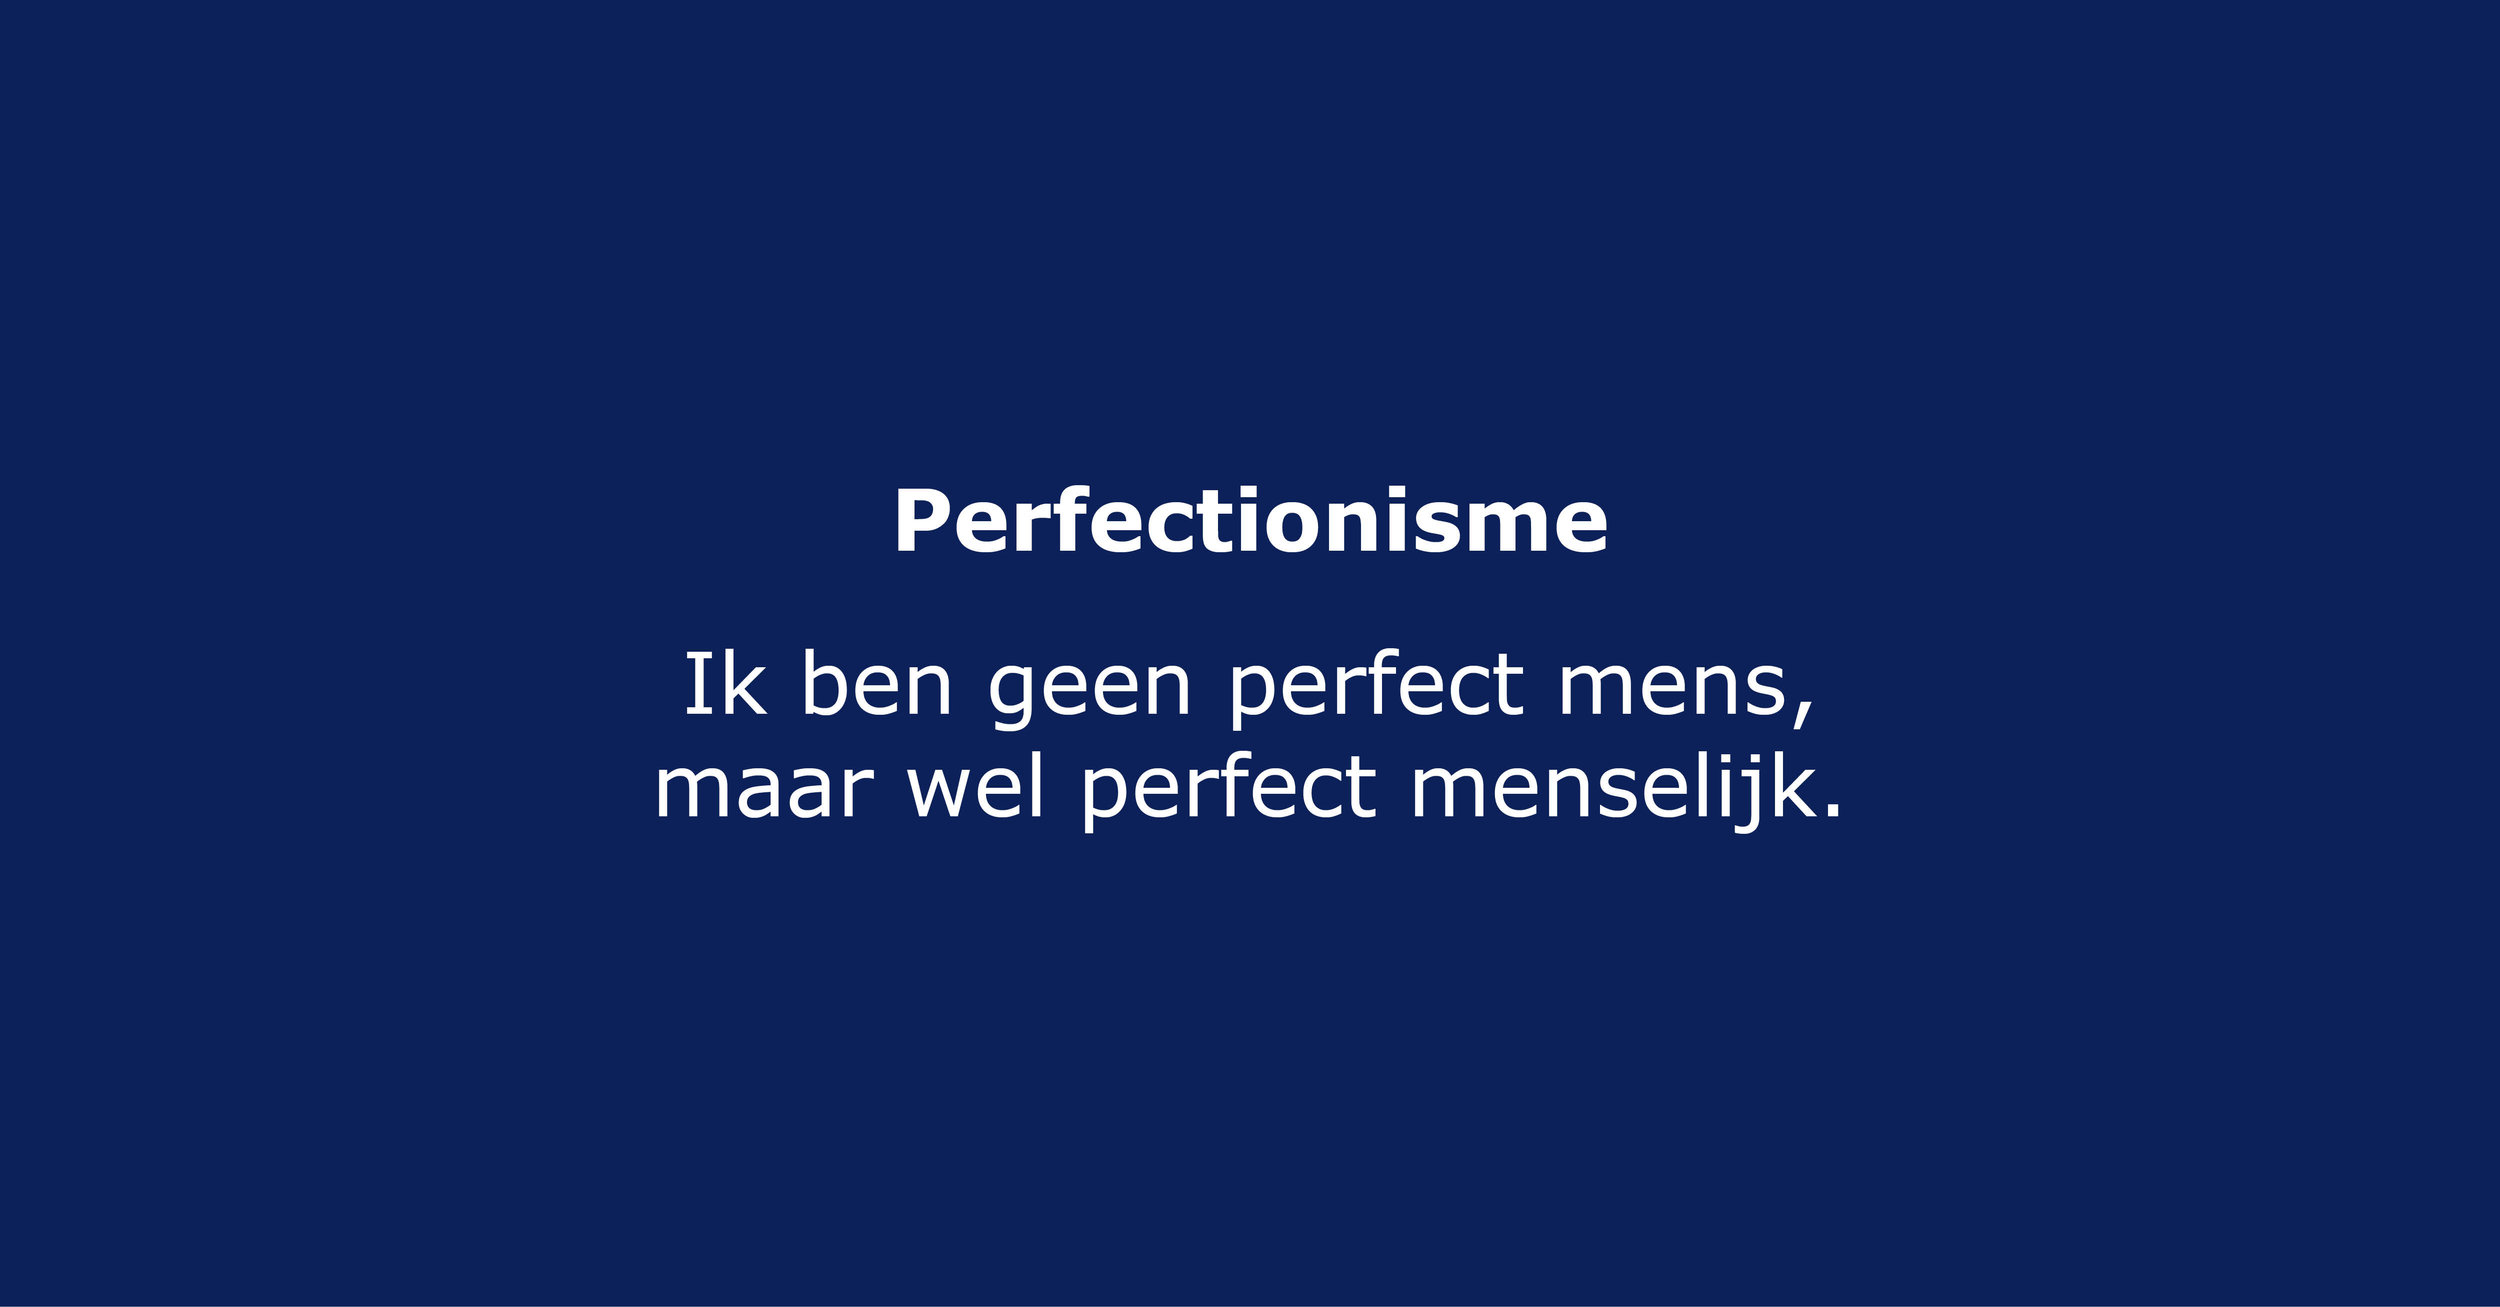 Perfectionisme artikel Instatera.org